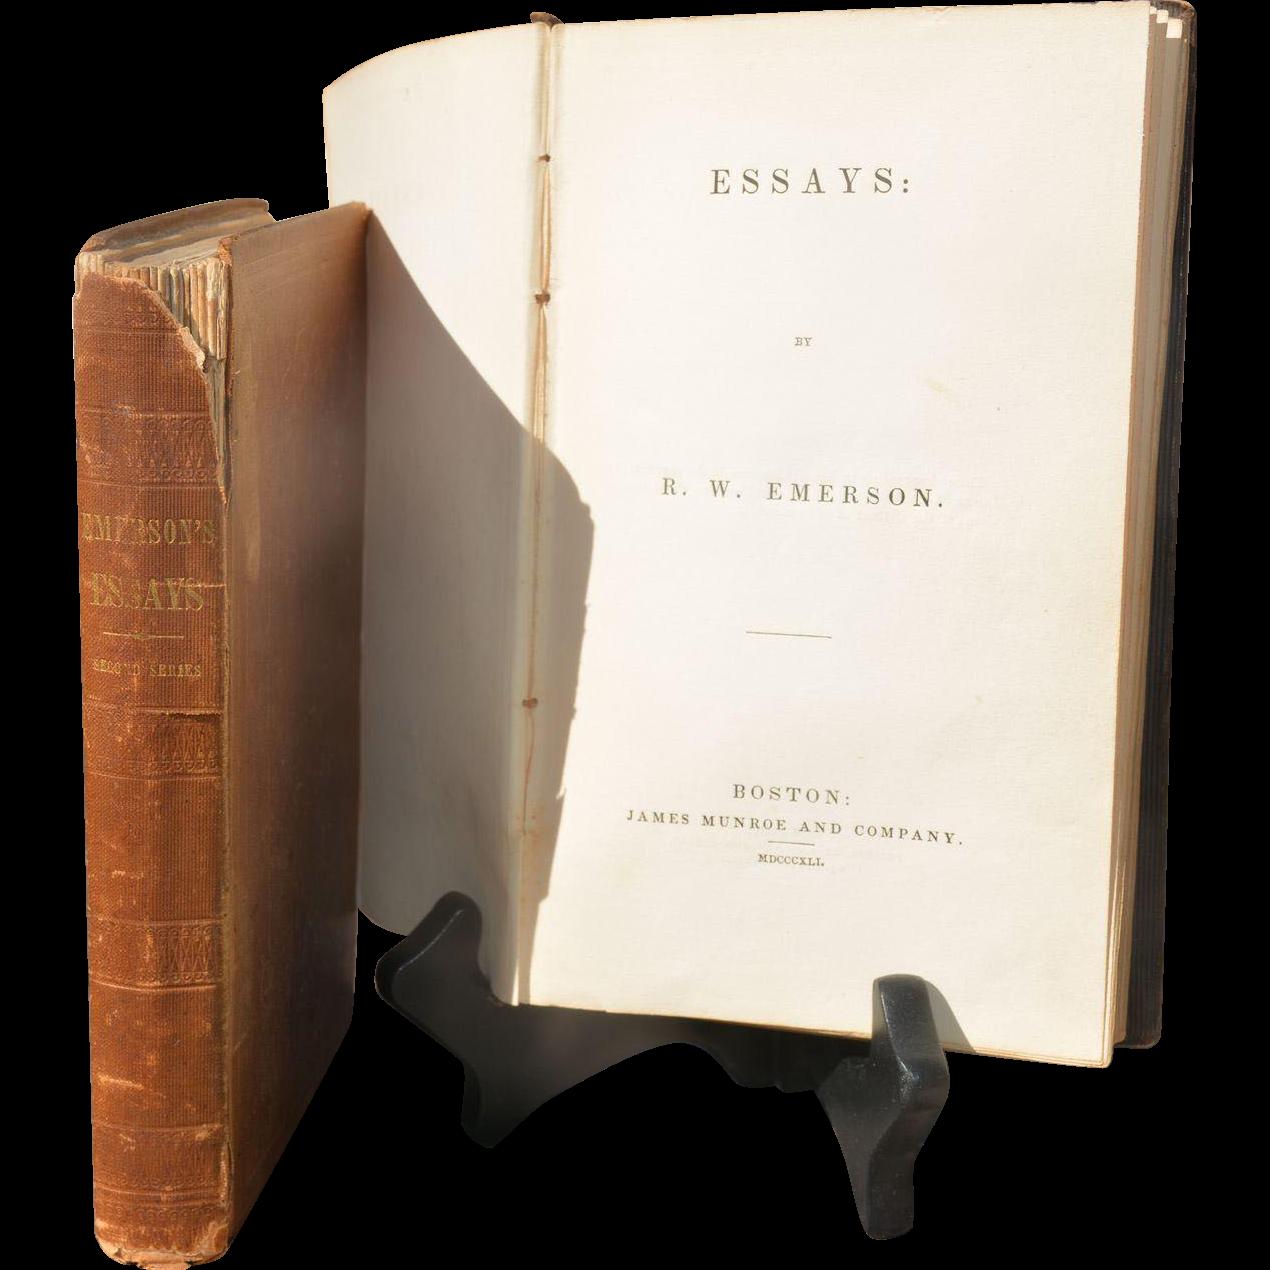 emerson essays first edition